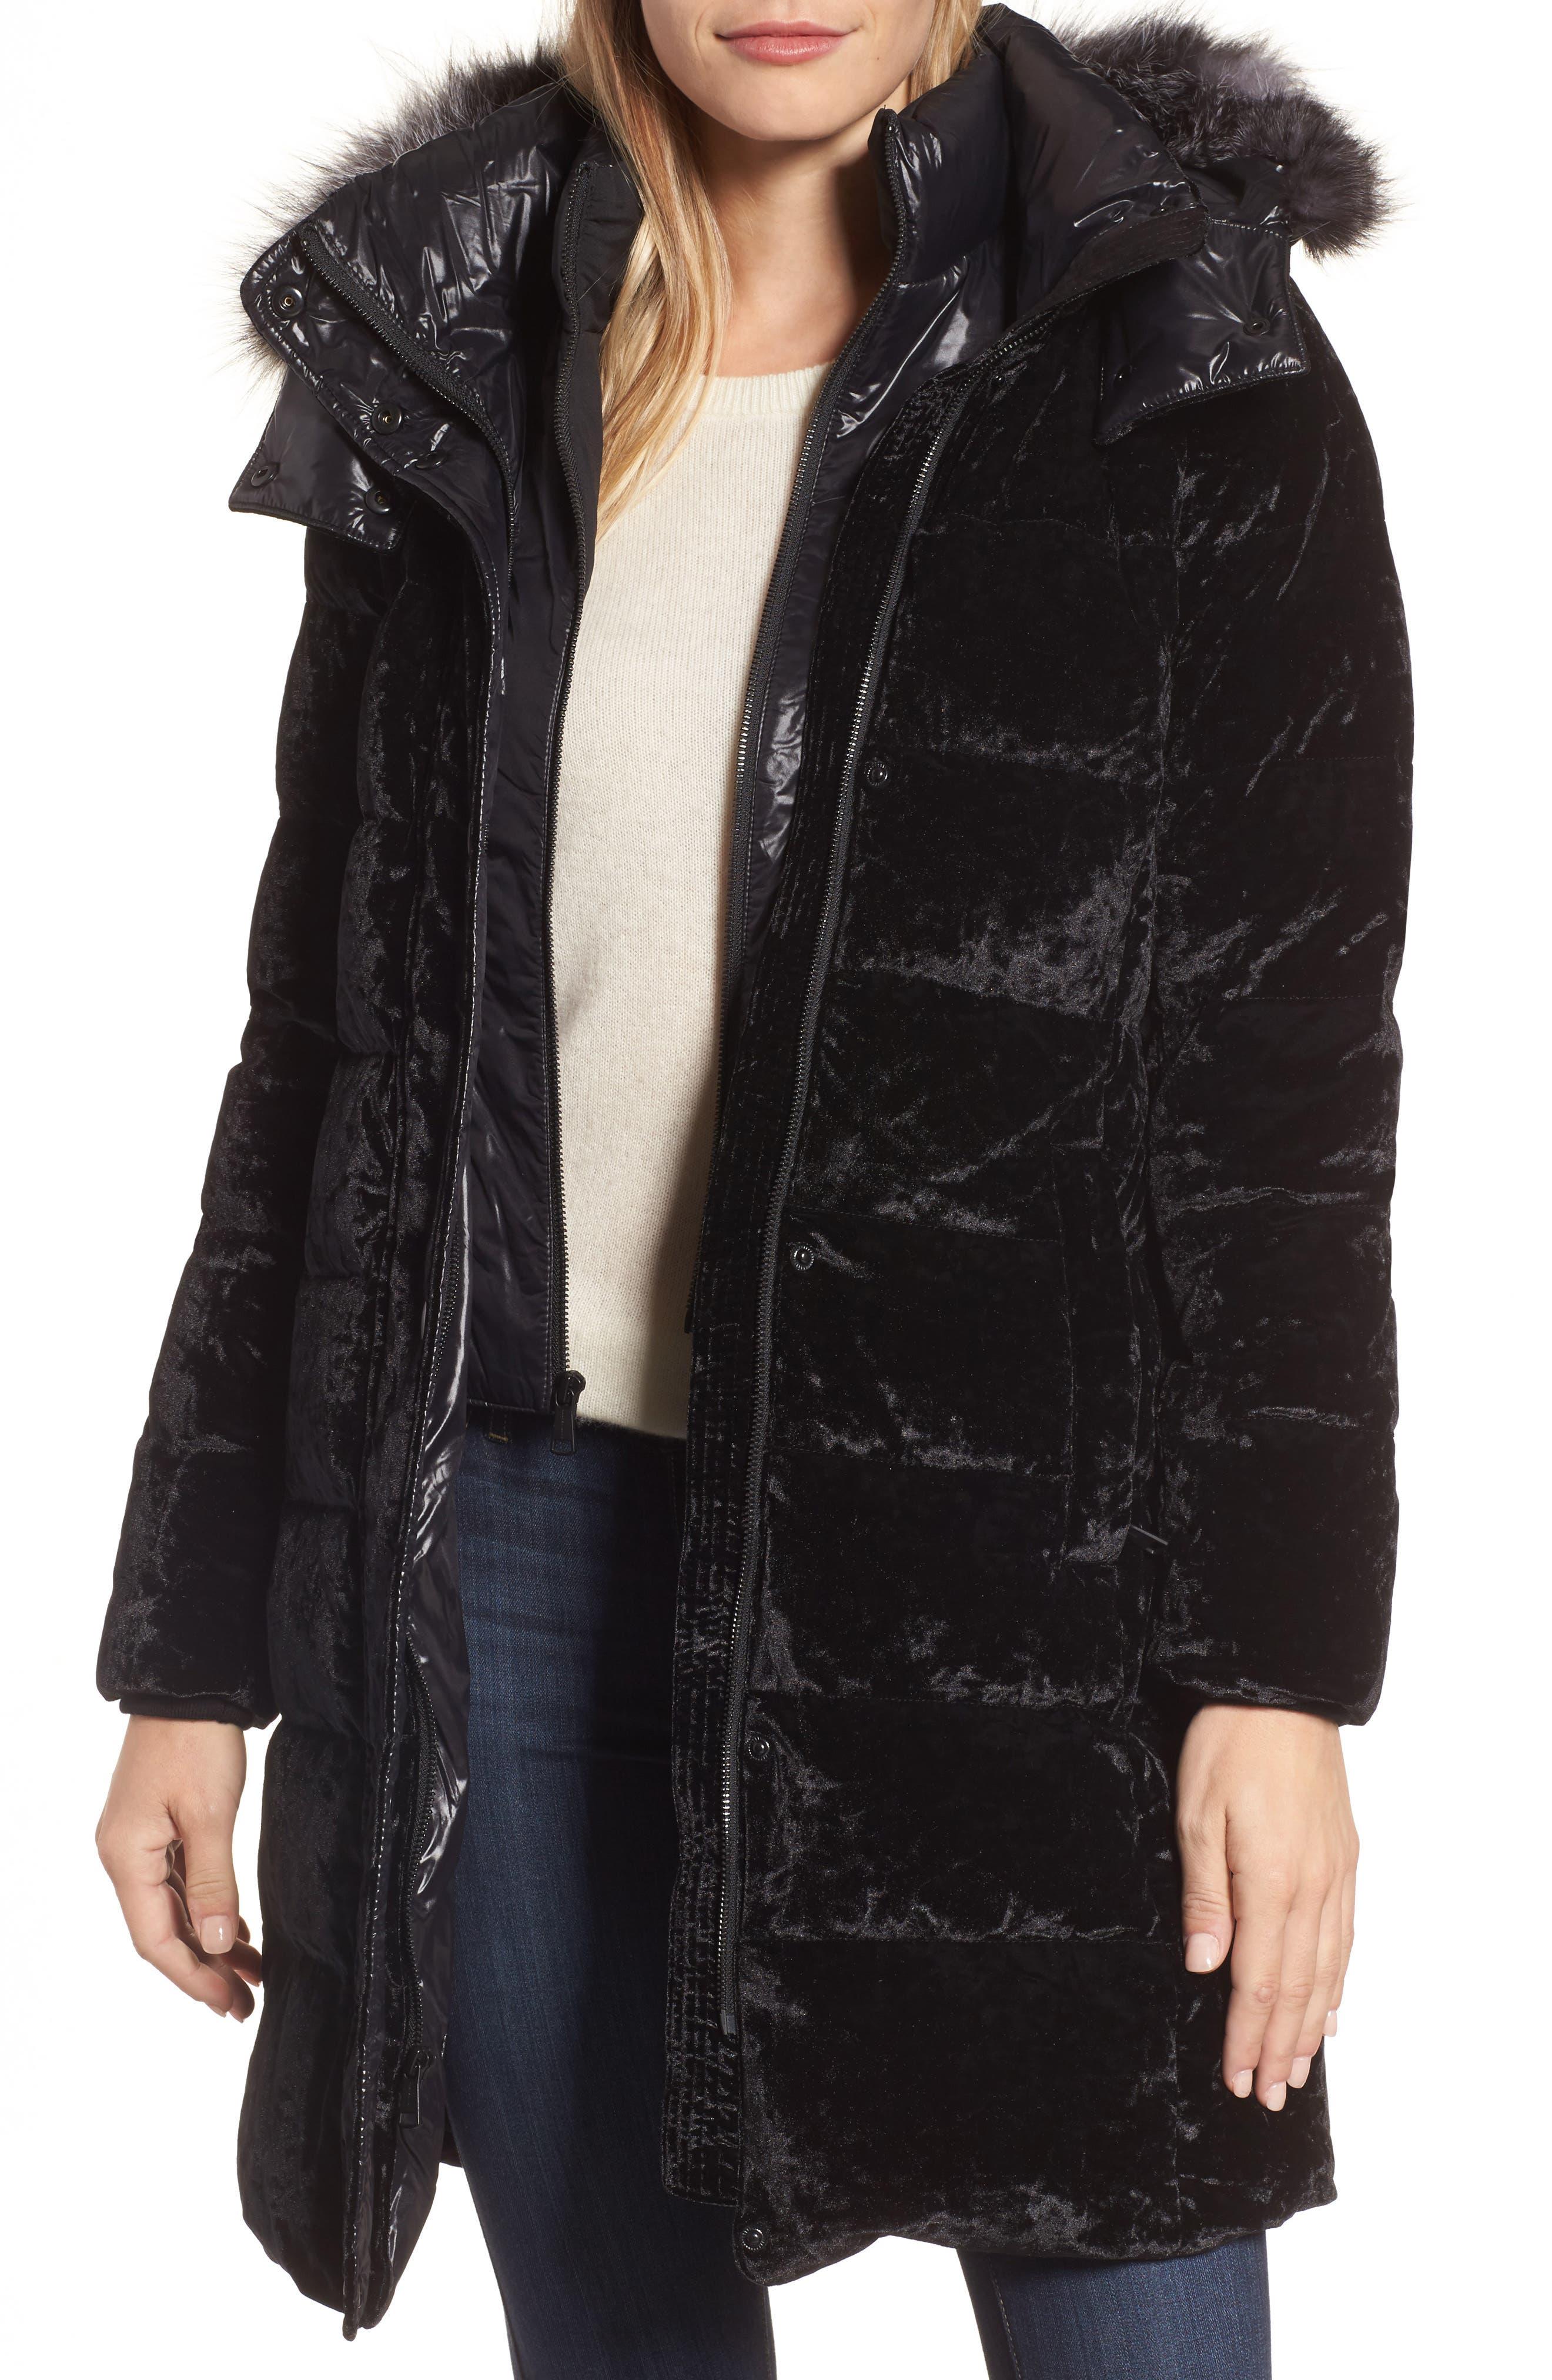 Velvet Down Jacket with Genuine Fox Fur,                             Main thumbnail 1, color,                             Black